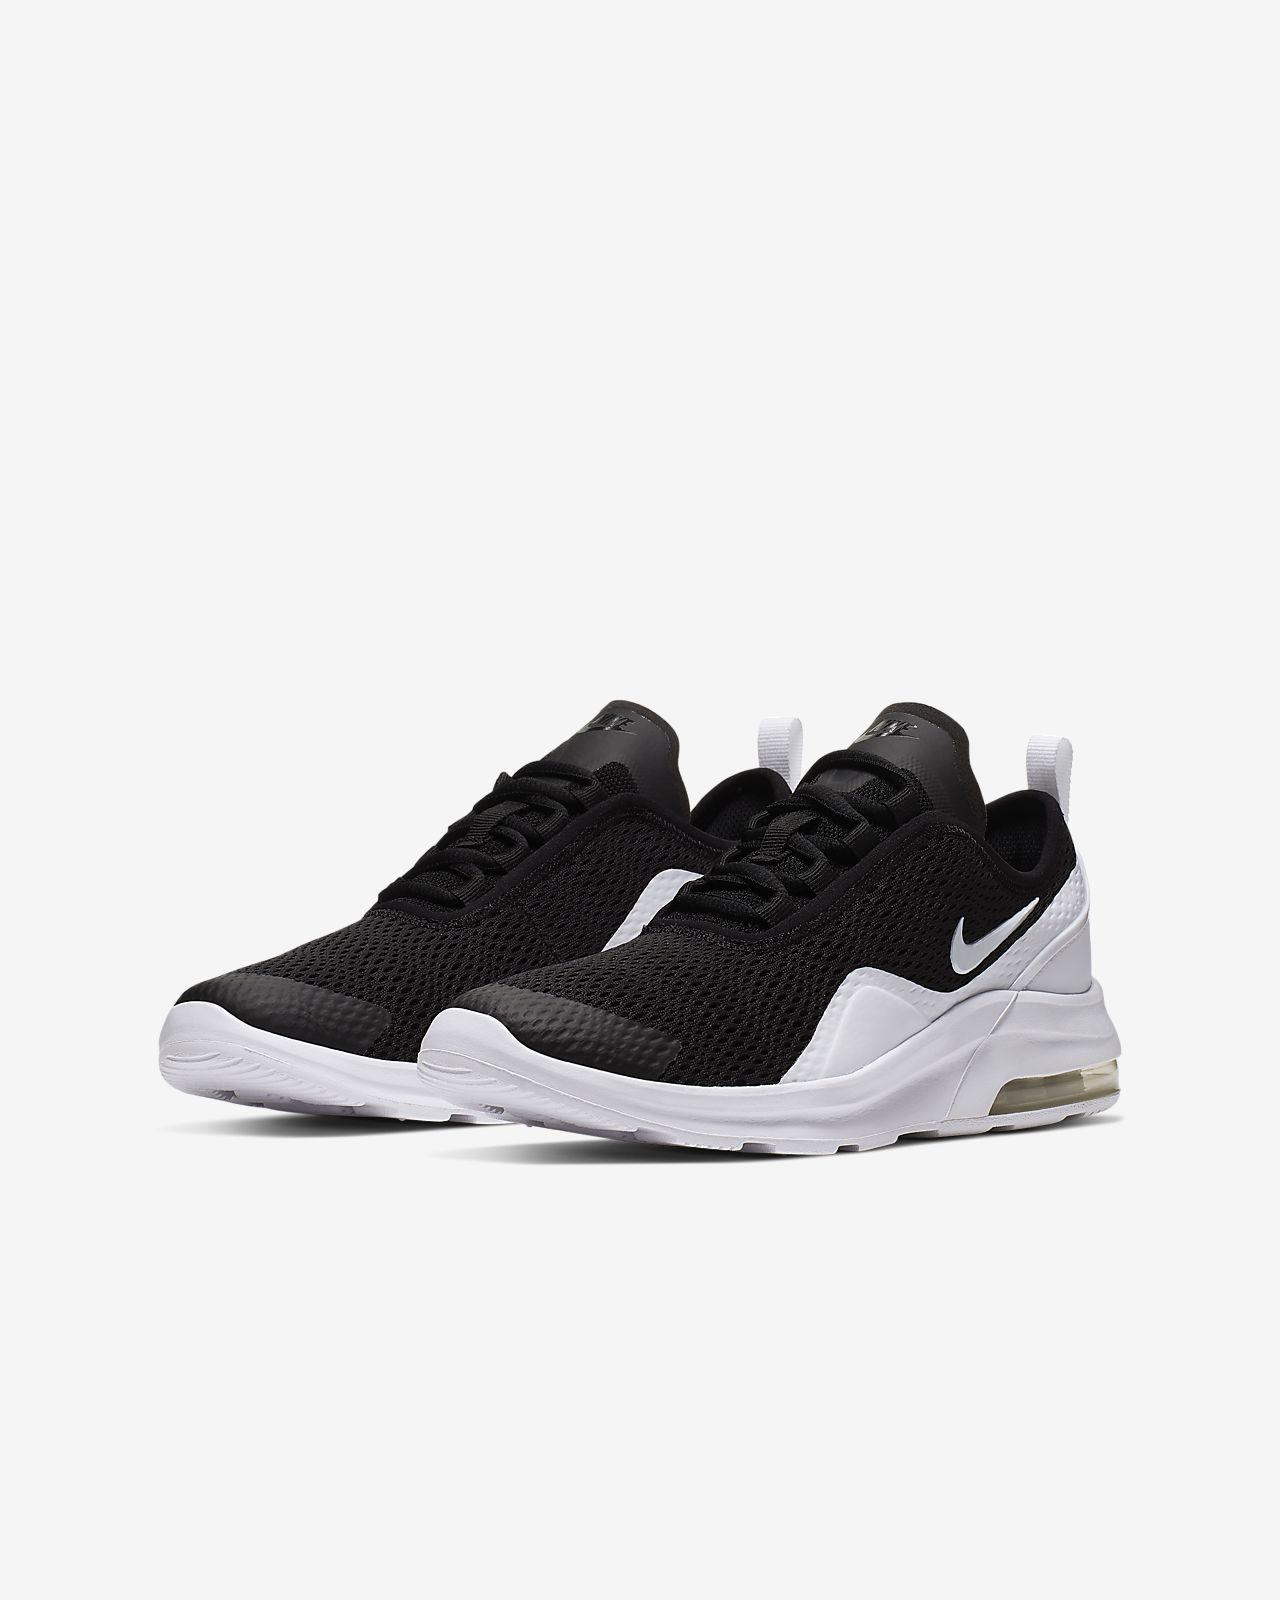 Sko Nike Air Max Motion 2 för ungdom